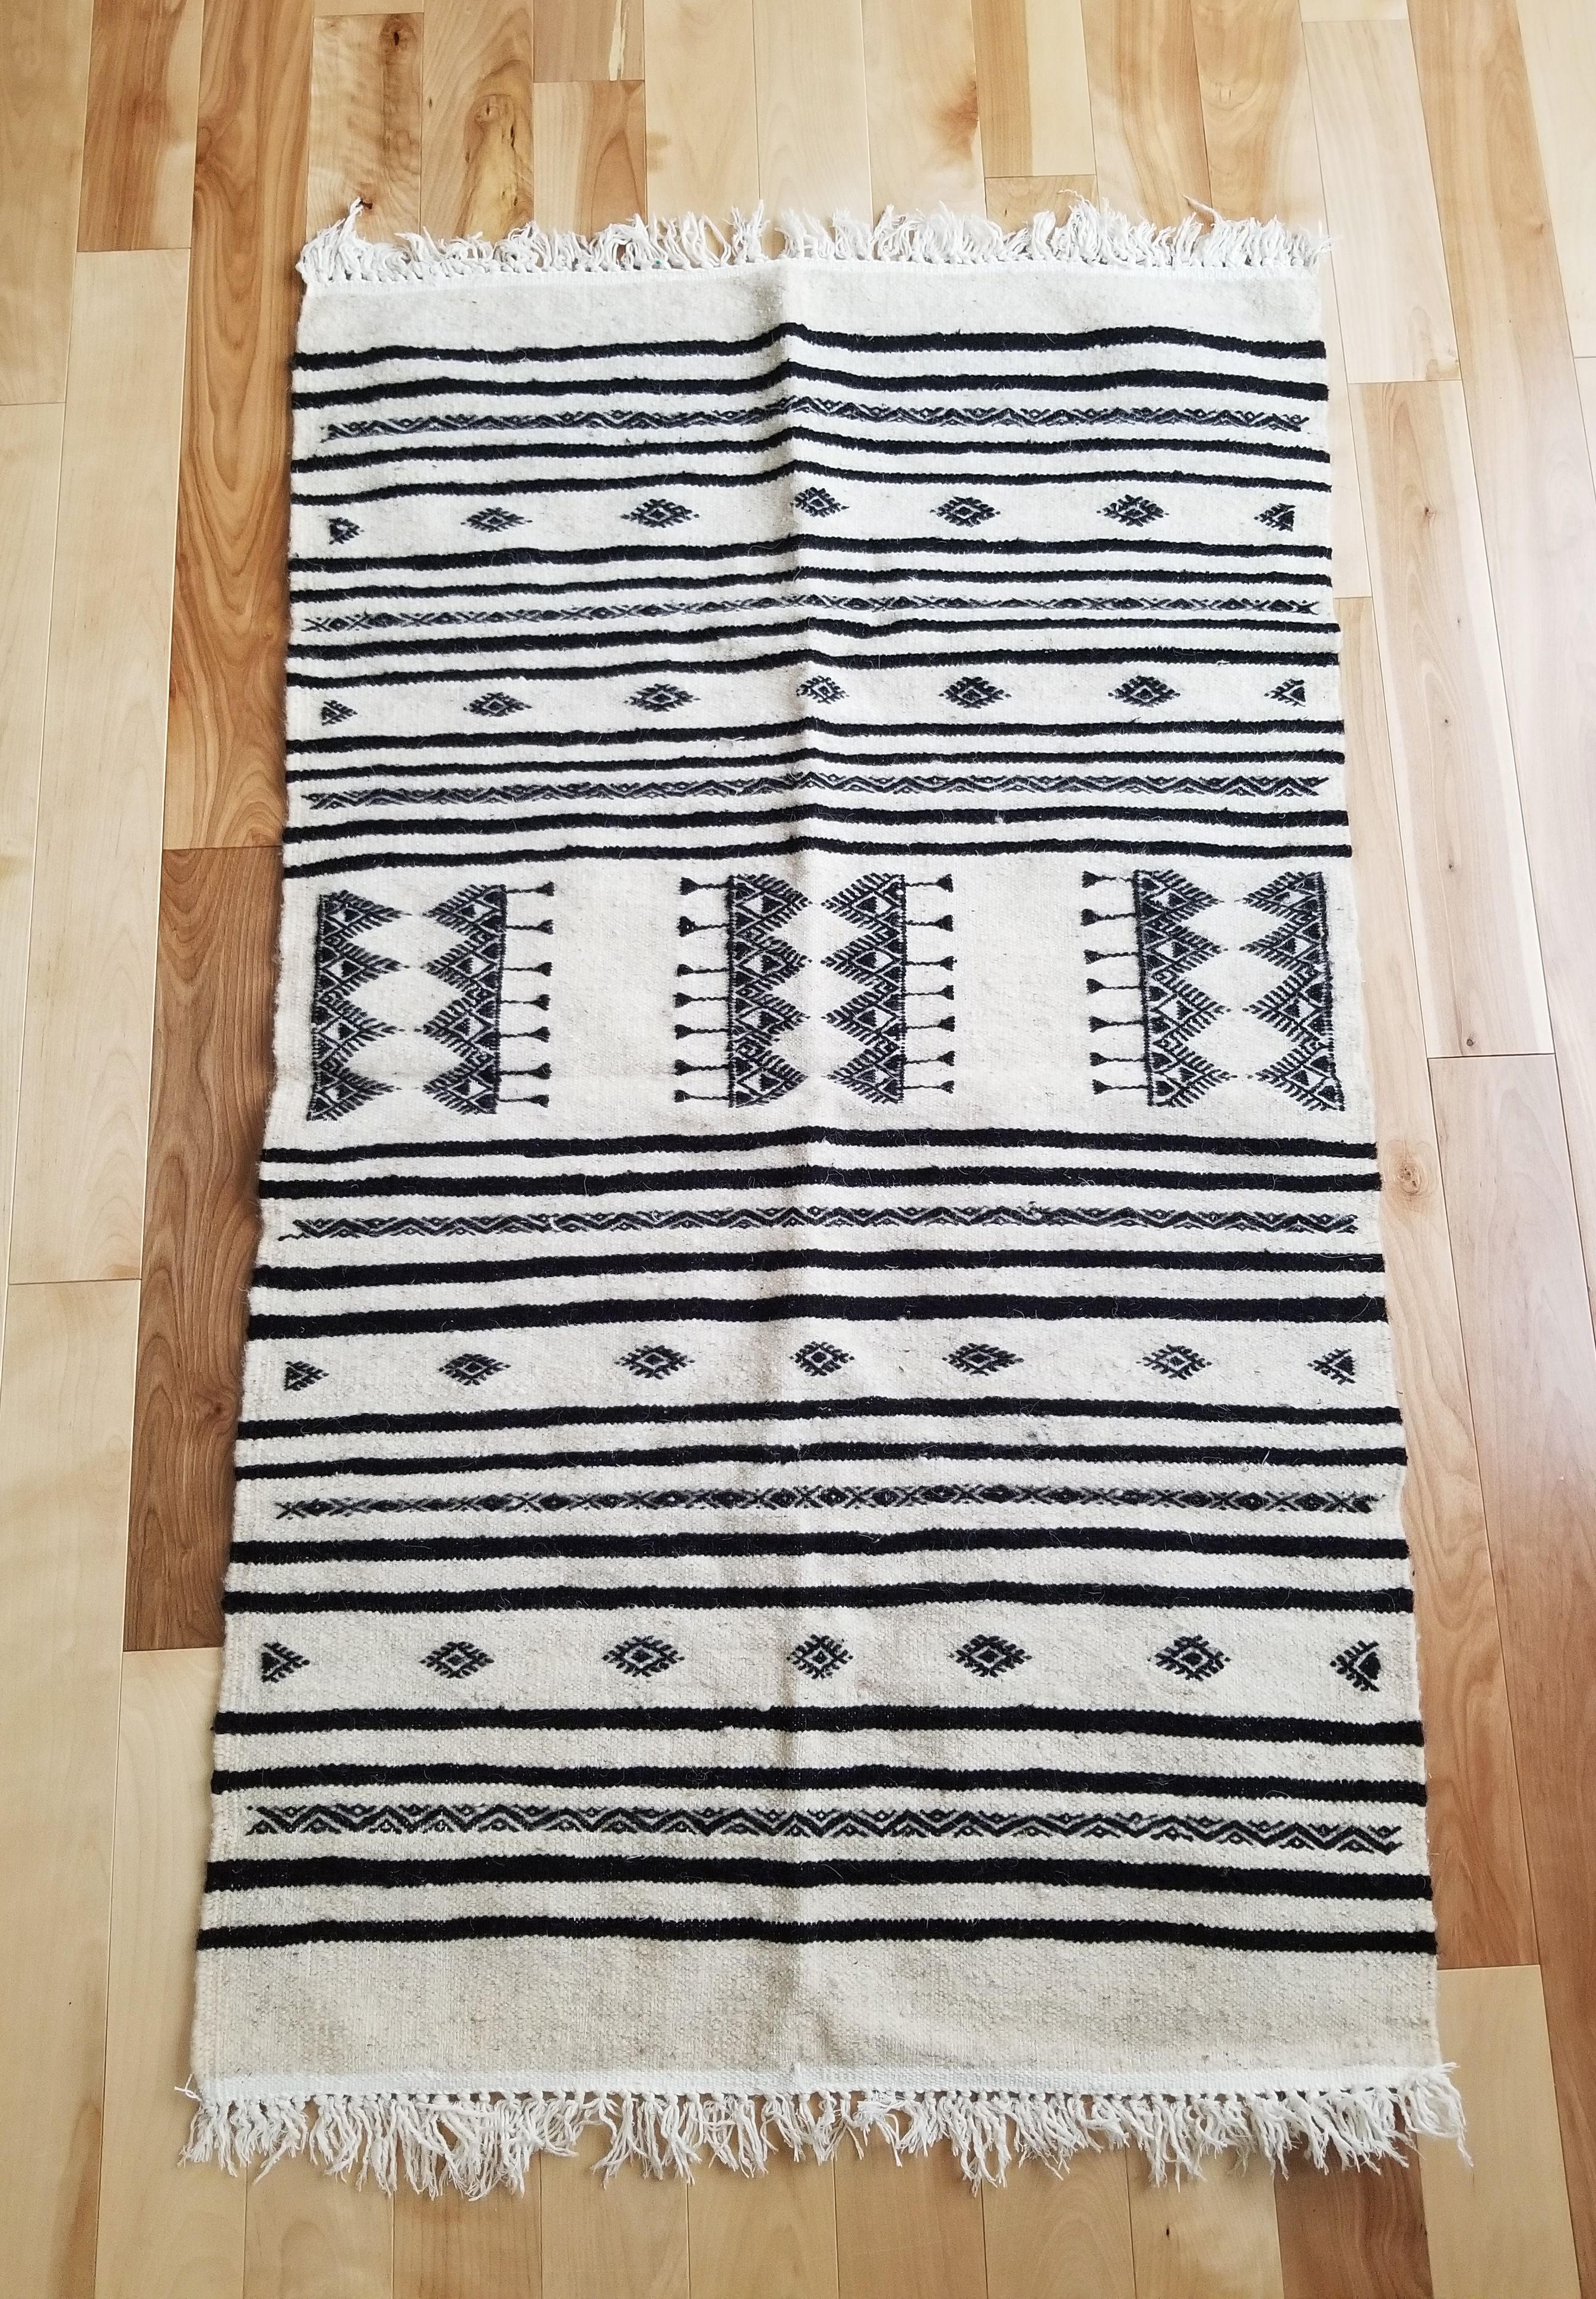 margoum tunisien tapis laine boho ecru motifs noirs 2 3 x4